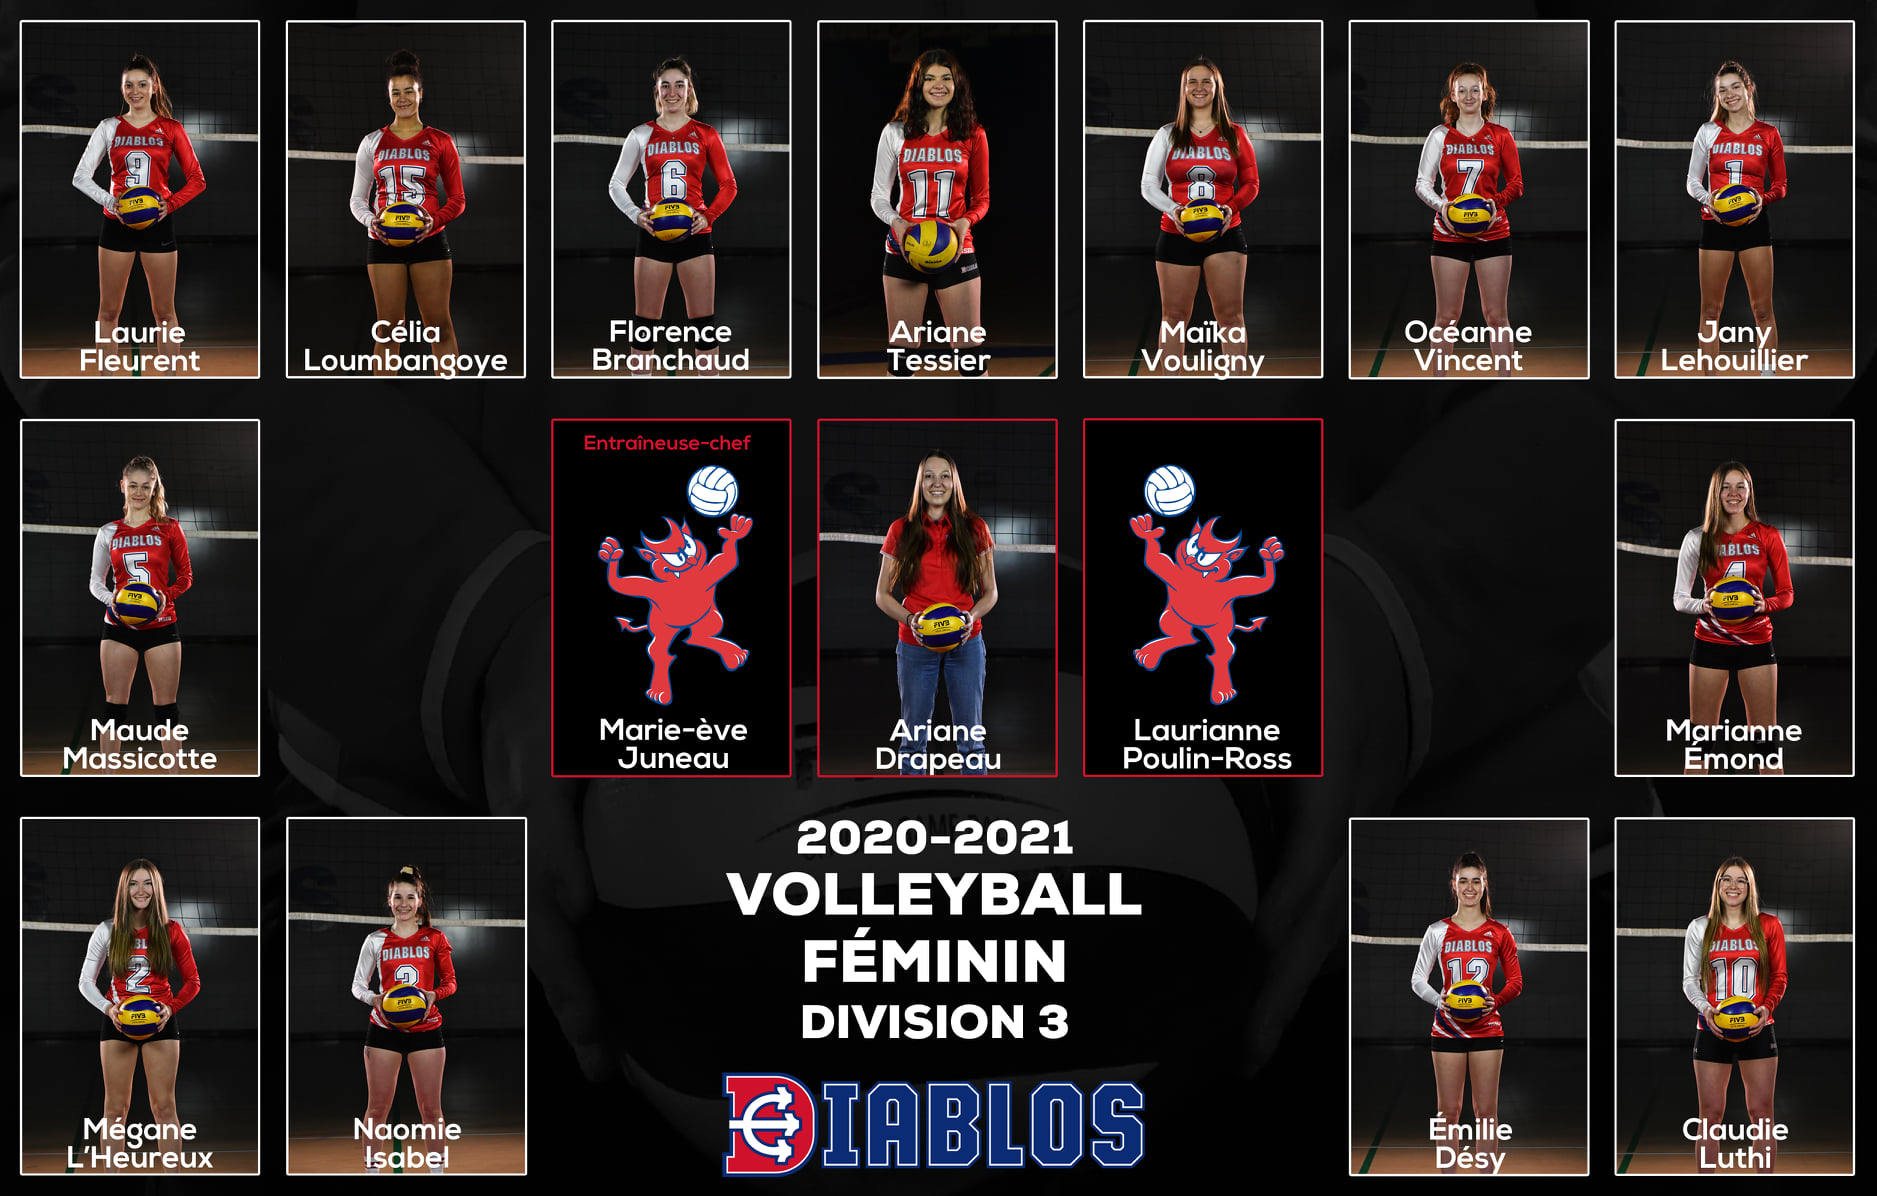 Équipe Diablos volleyball féminin D3